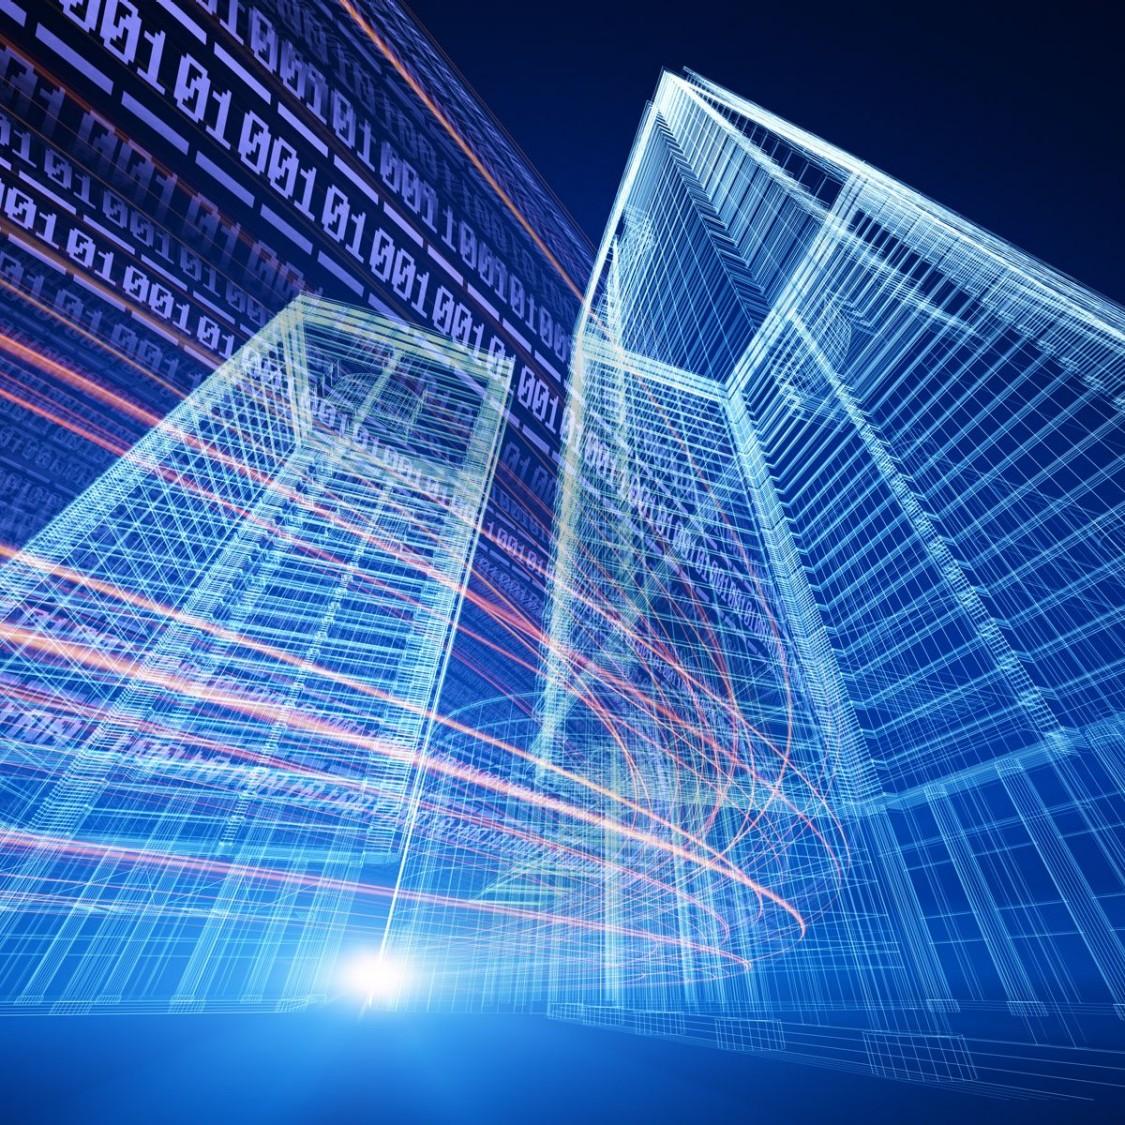 Siemens delivers smart buildings